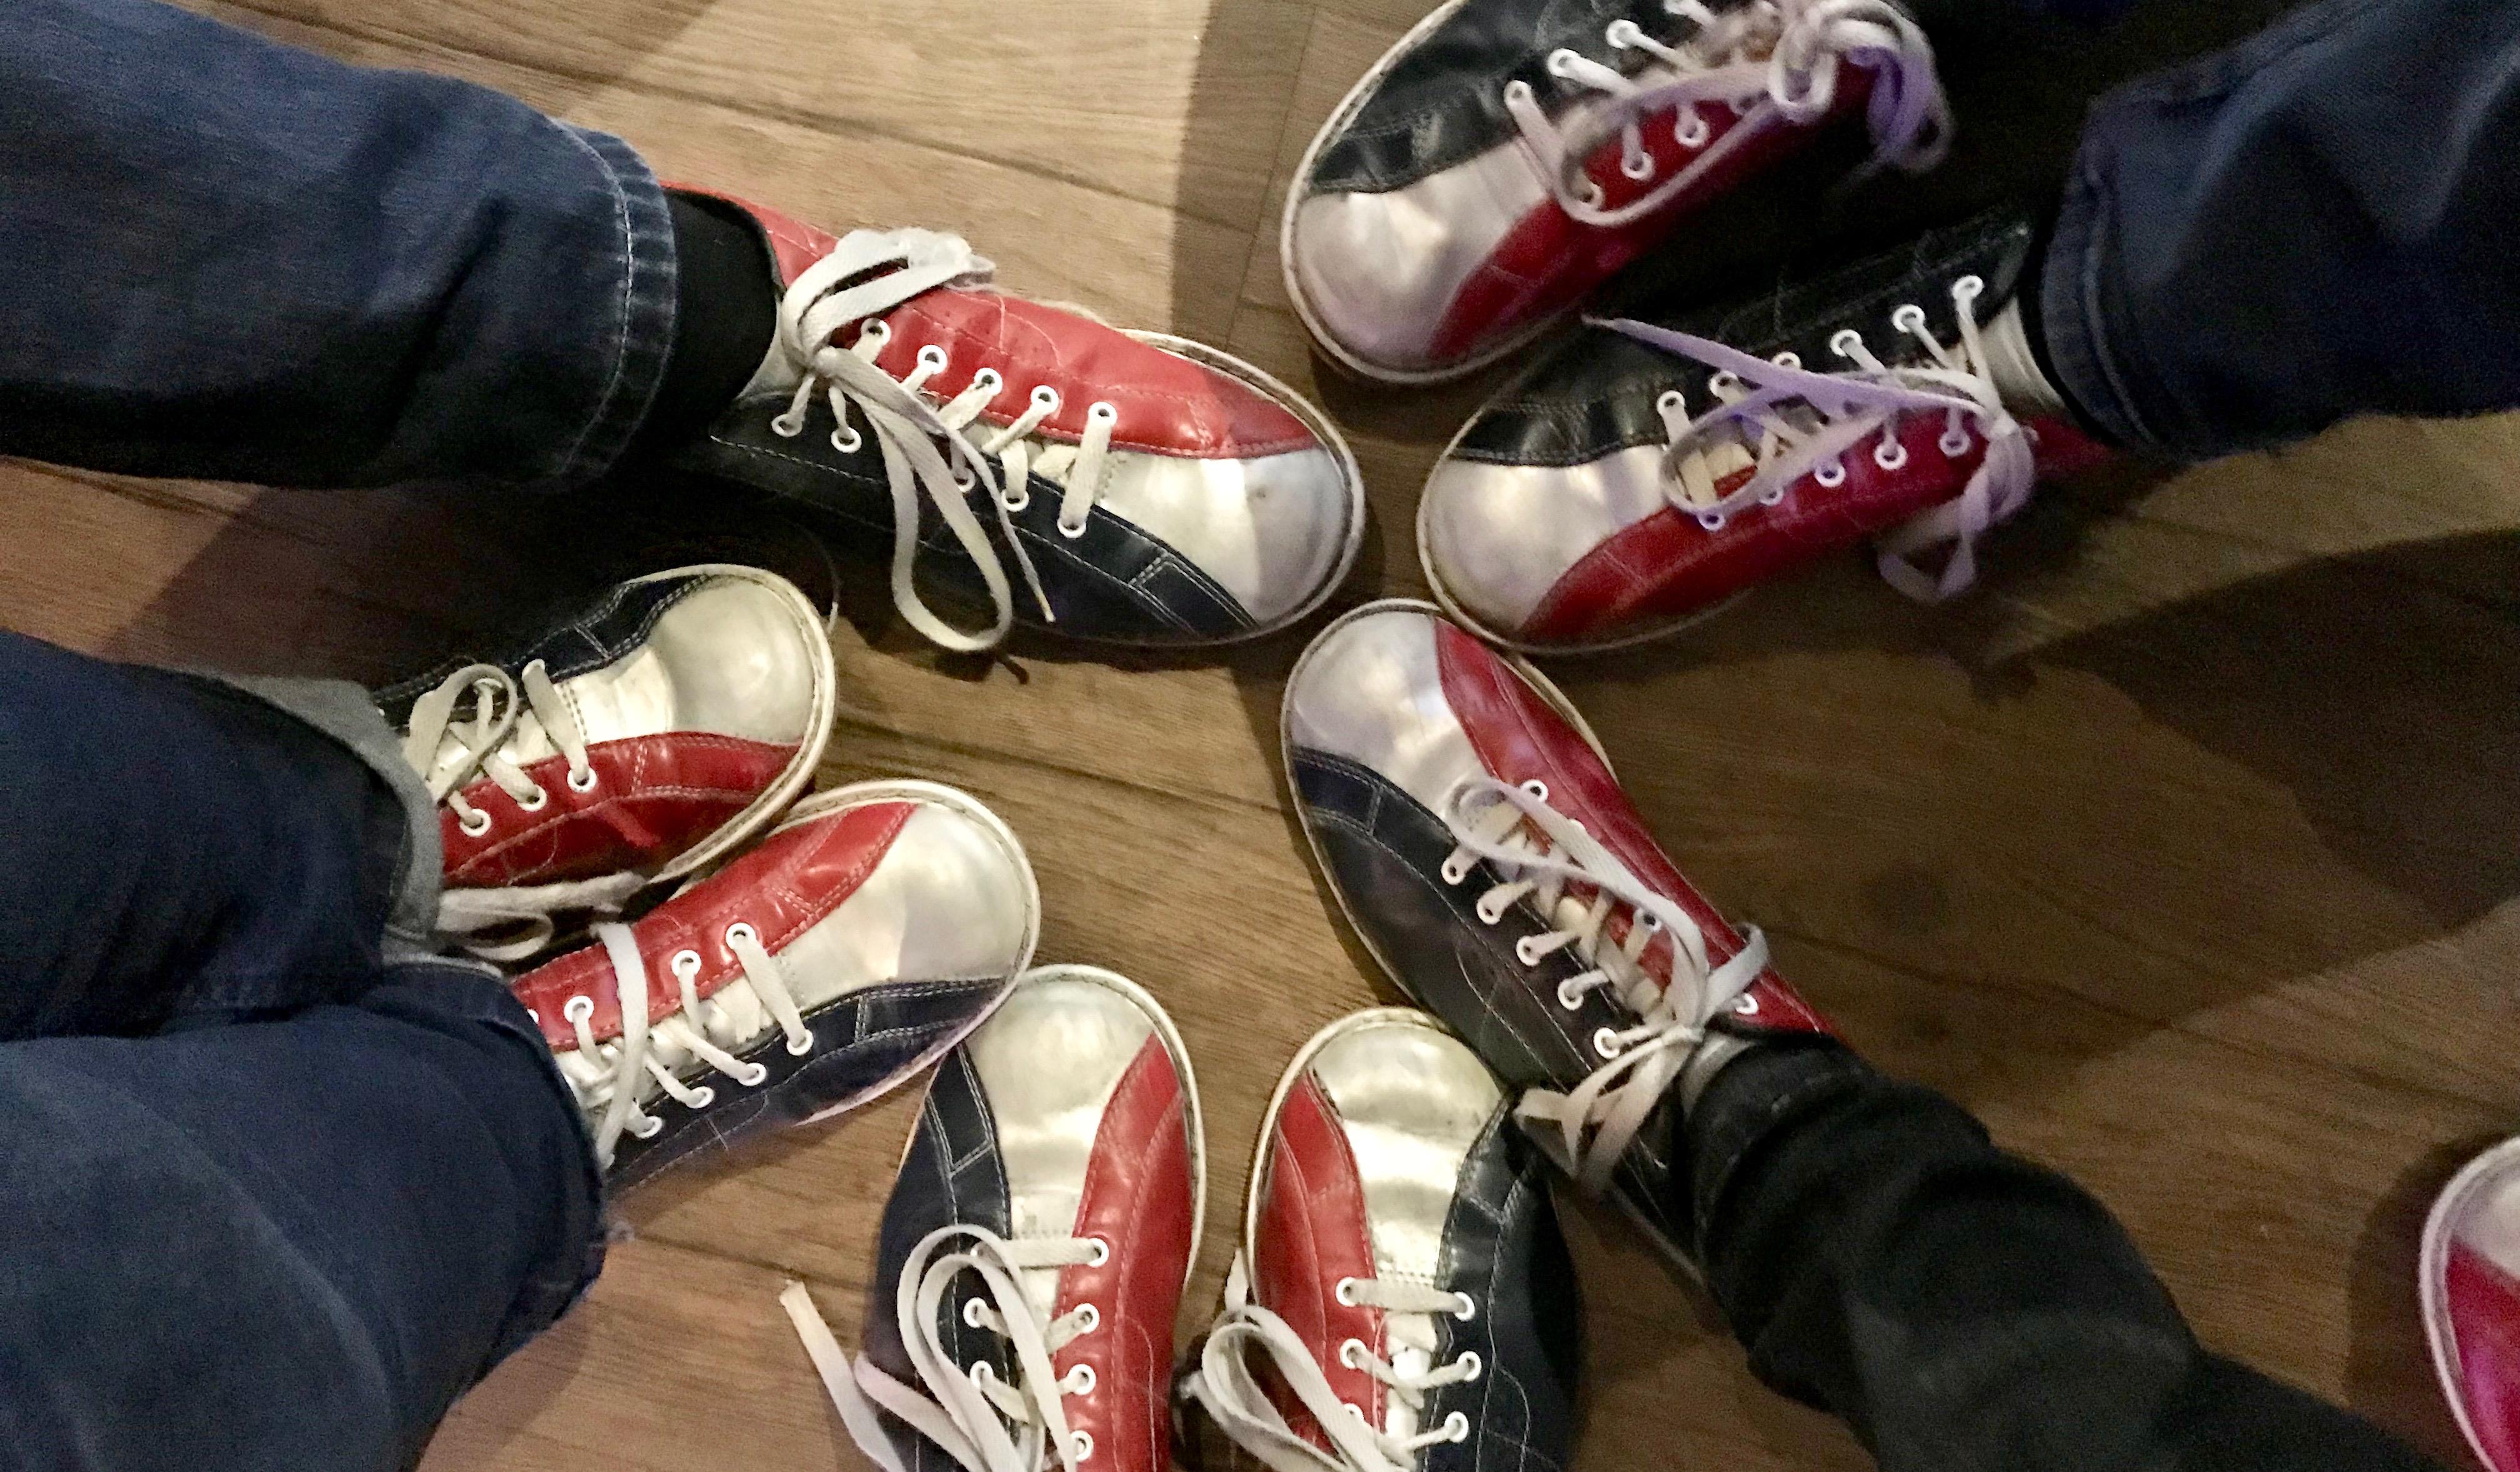 Vereinsaktivität 3: Bowling